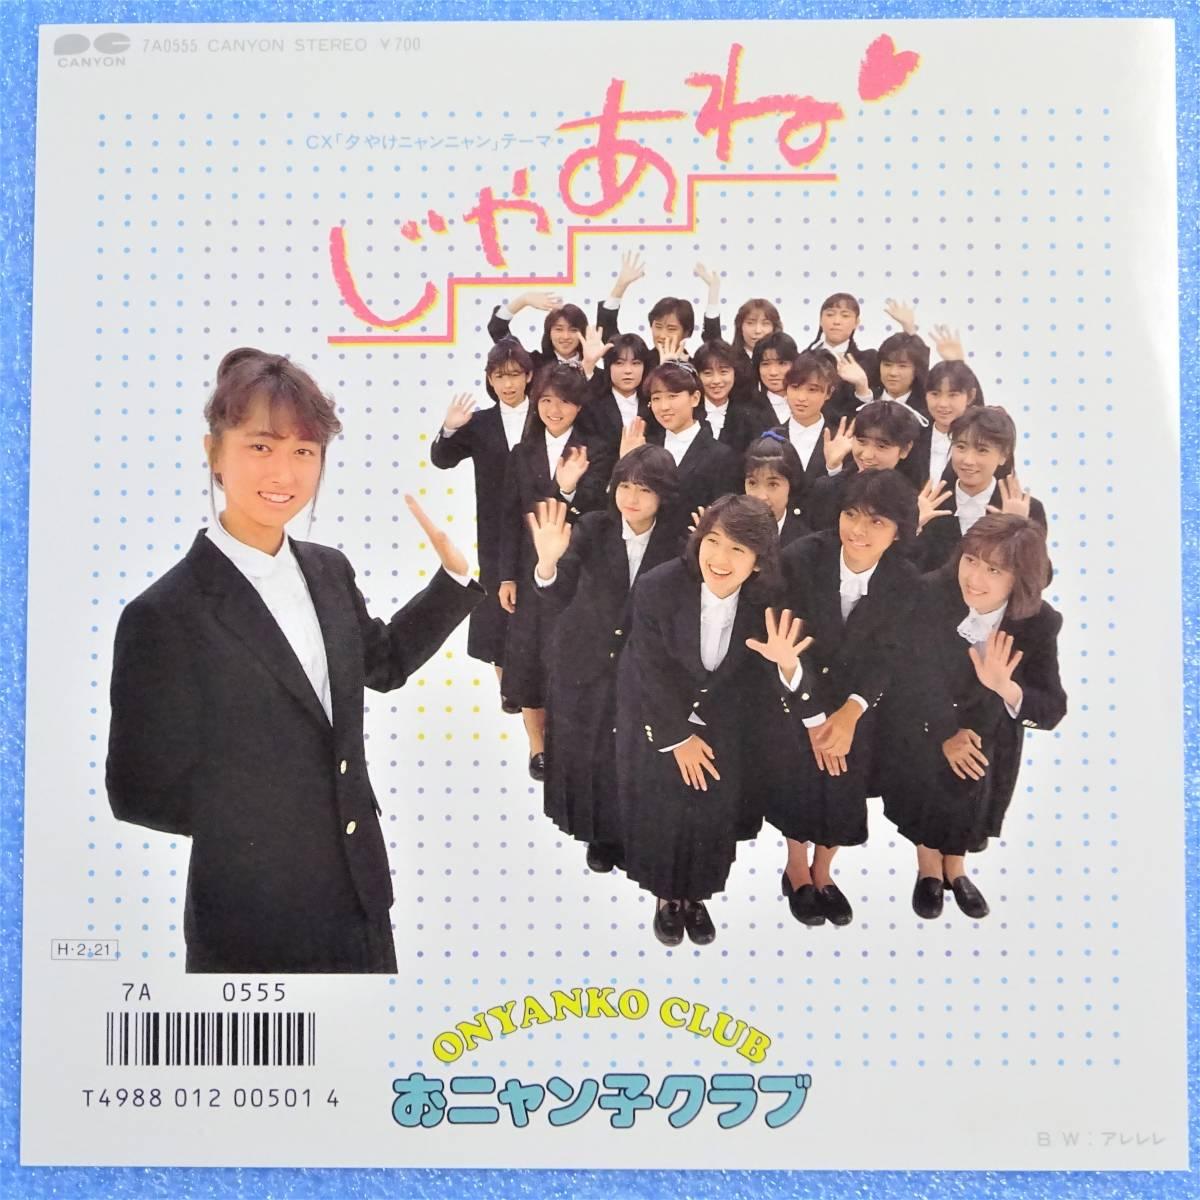 7' EP おニャン子クラブ / じゃあね 国内盤 1986年 ONYANKO CLUB 夕やけニャンニャン_画像1